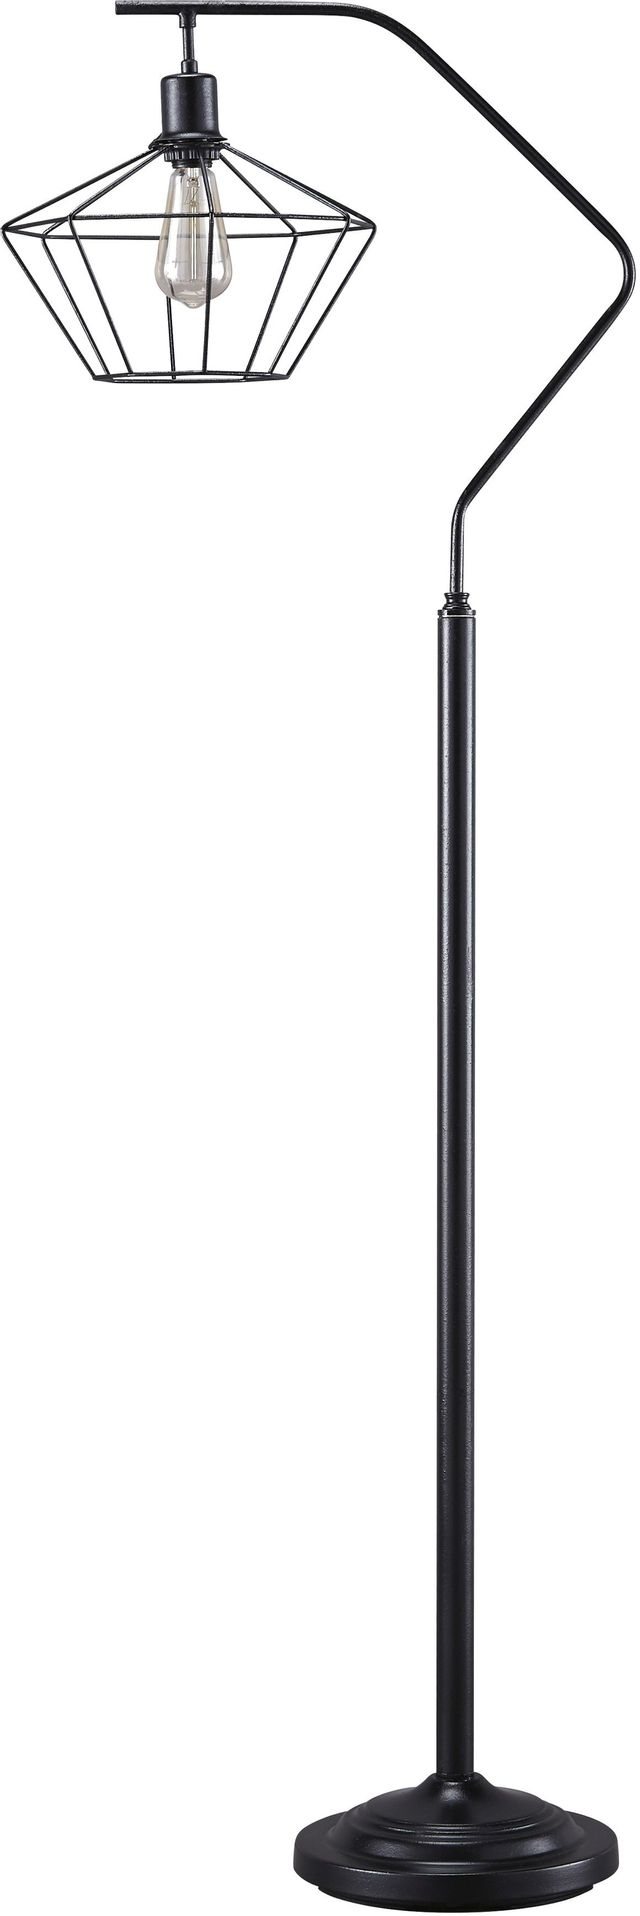 Signature Design by Ashley® Makeika Black Metal Floor Lamp-L207181